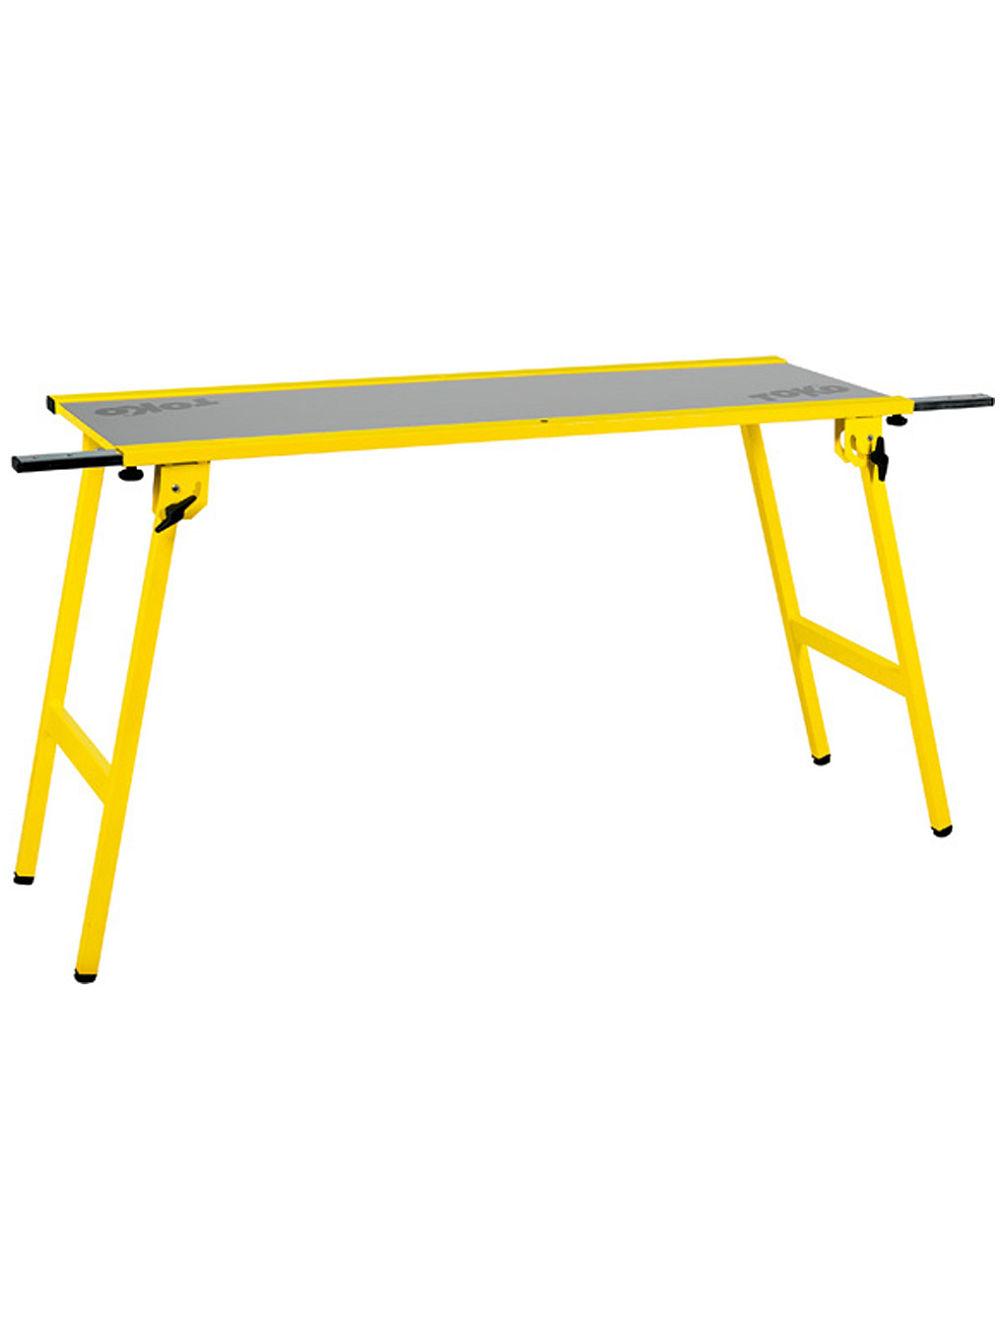 toko-workbench-110x50cm